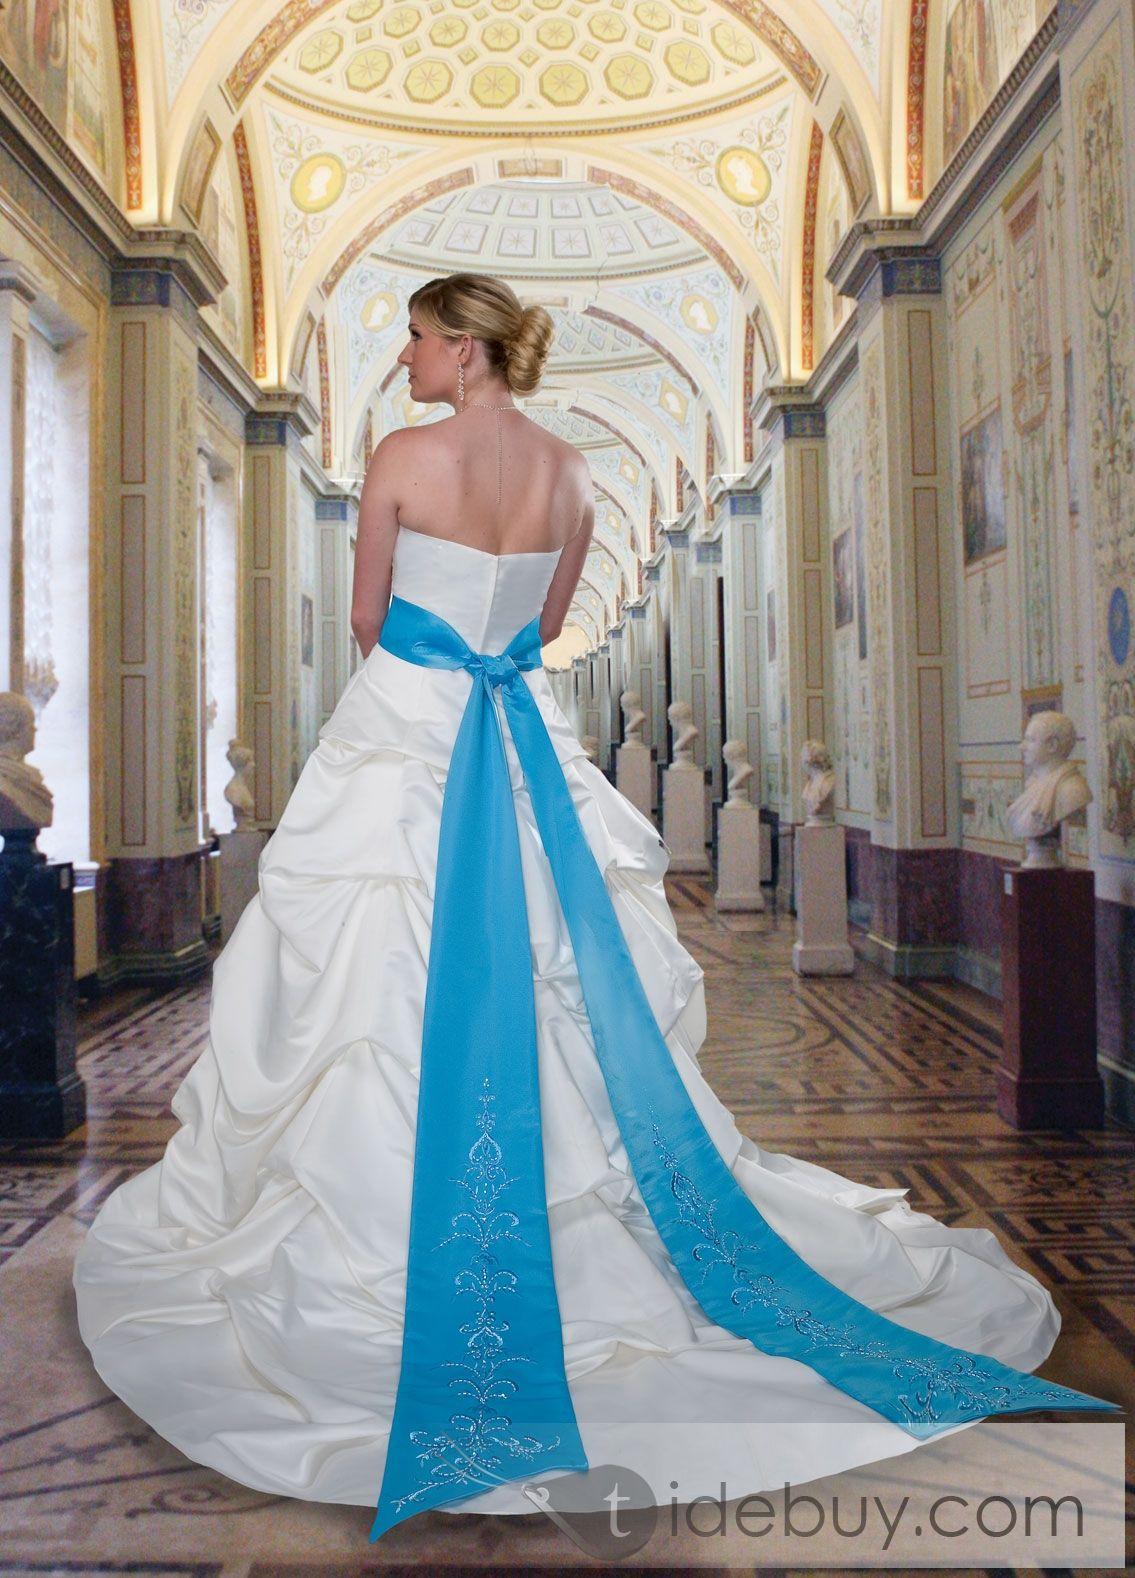 Plus Size Teal Bridesmaid Dresses Teal Bridesmaid Dresses Evening Dresses Plus Size Prom Dresses [ 1104 x 736 Pixel ]